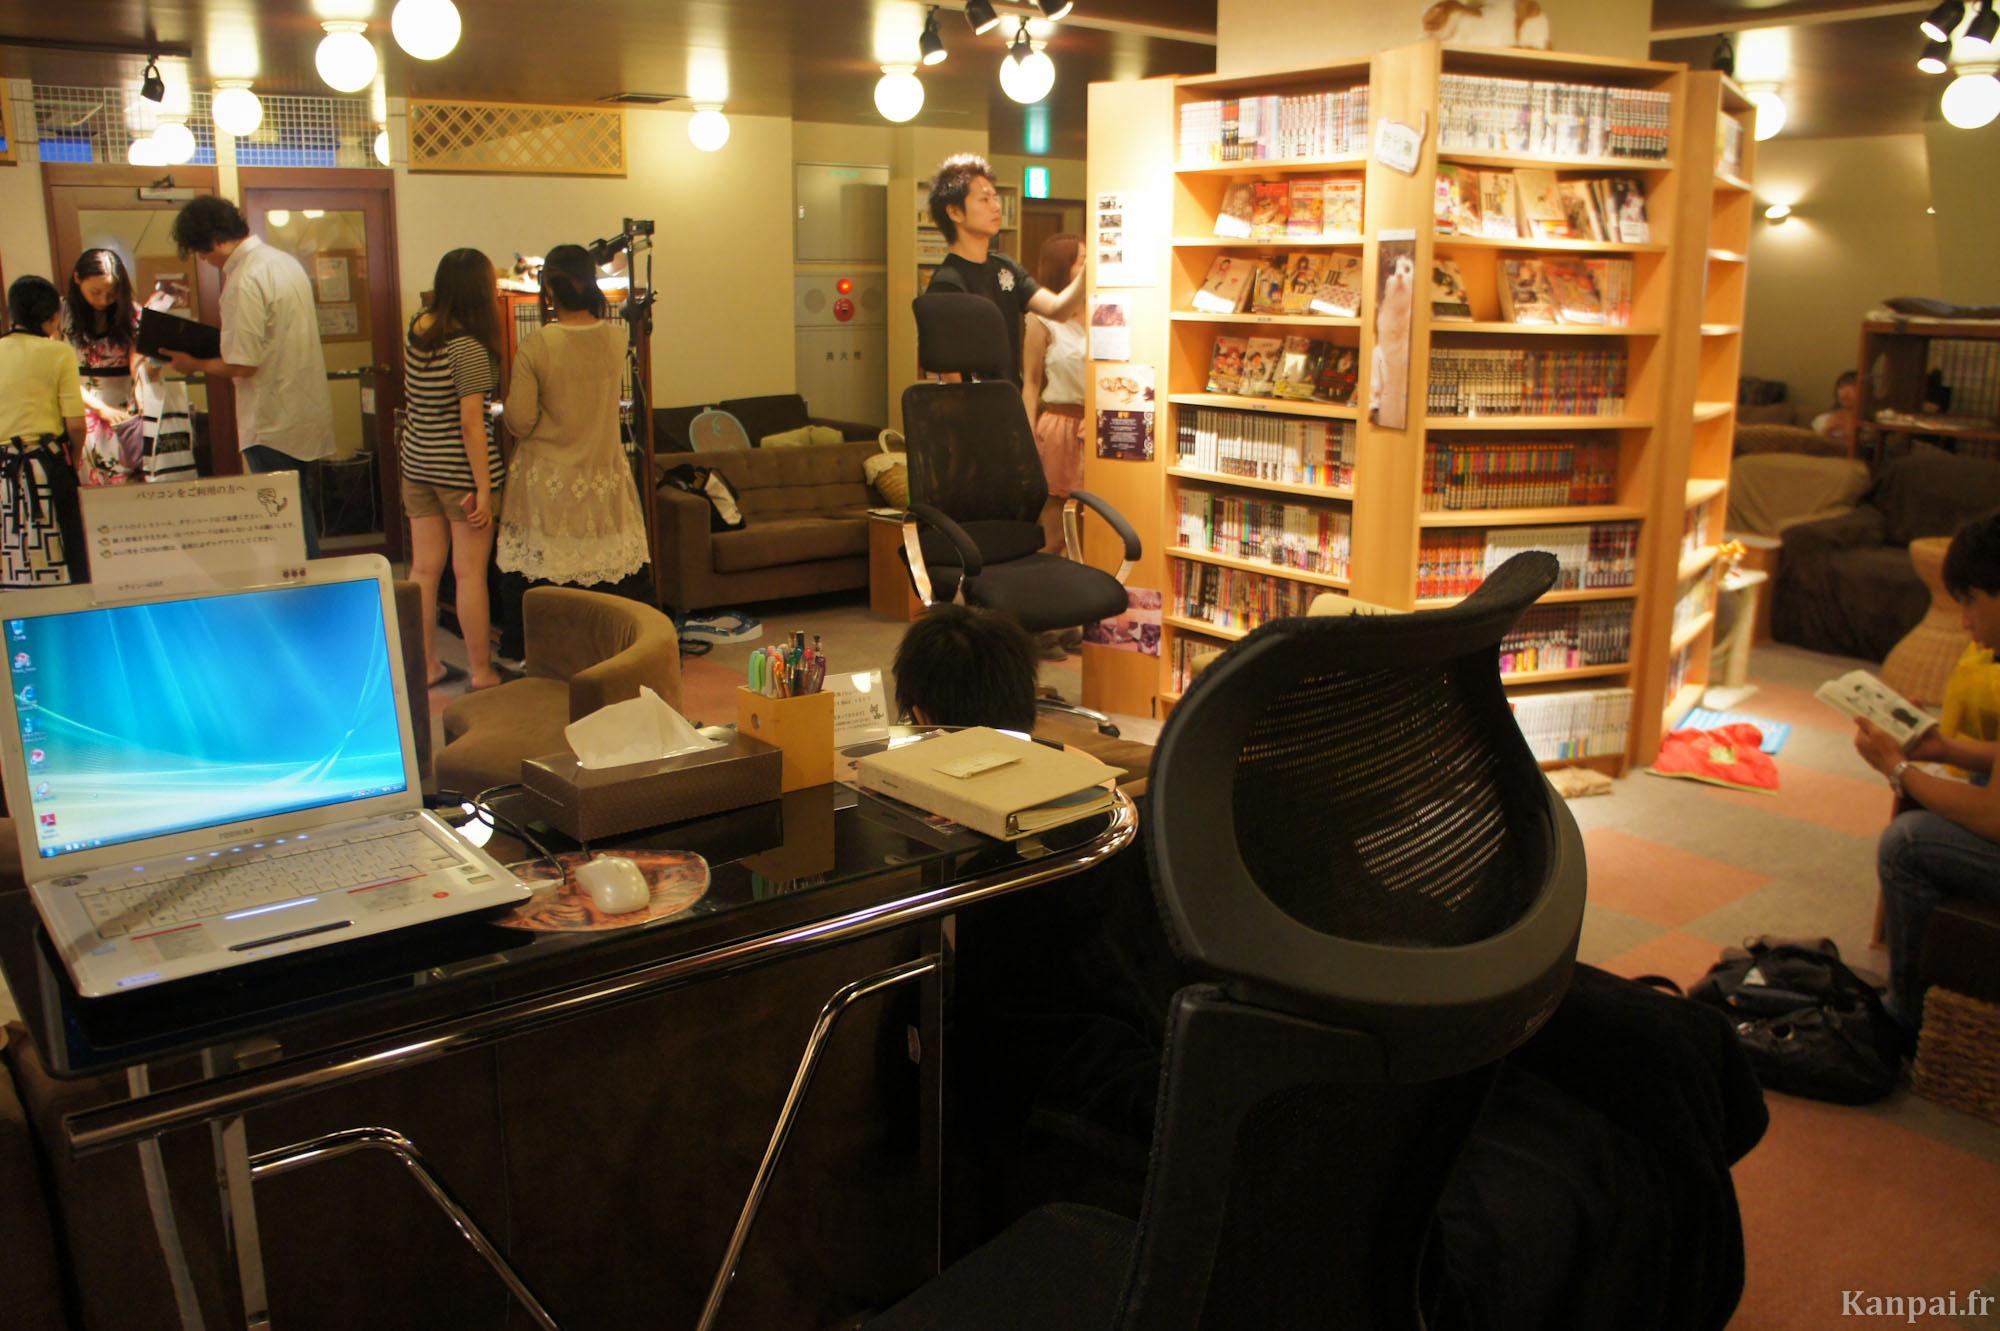 Neko Cafe Horaires